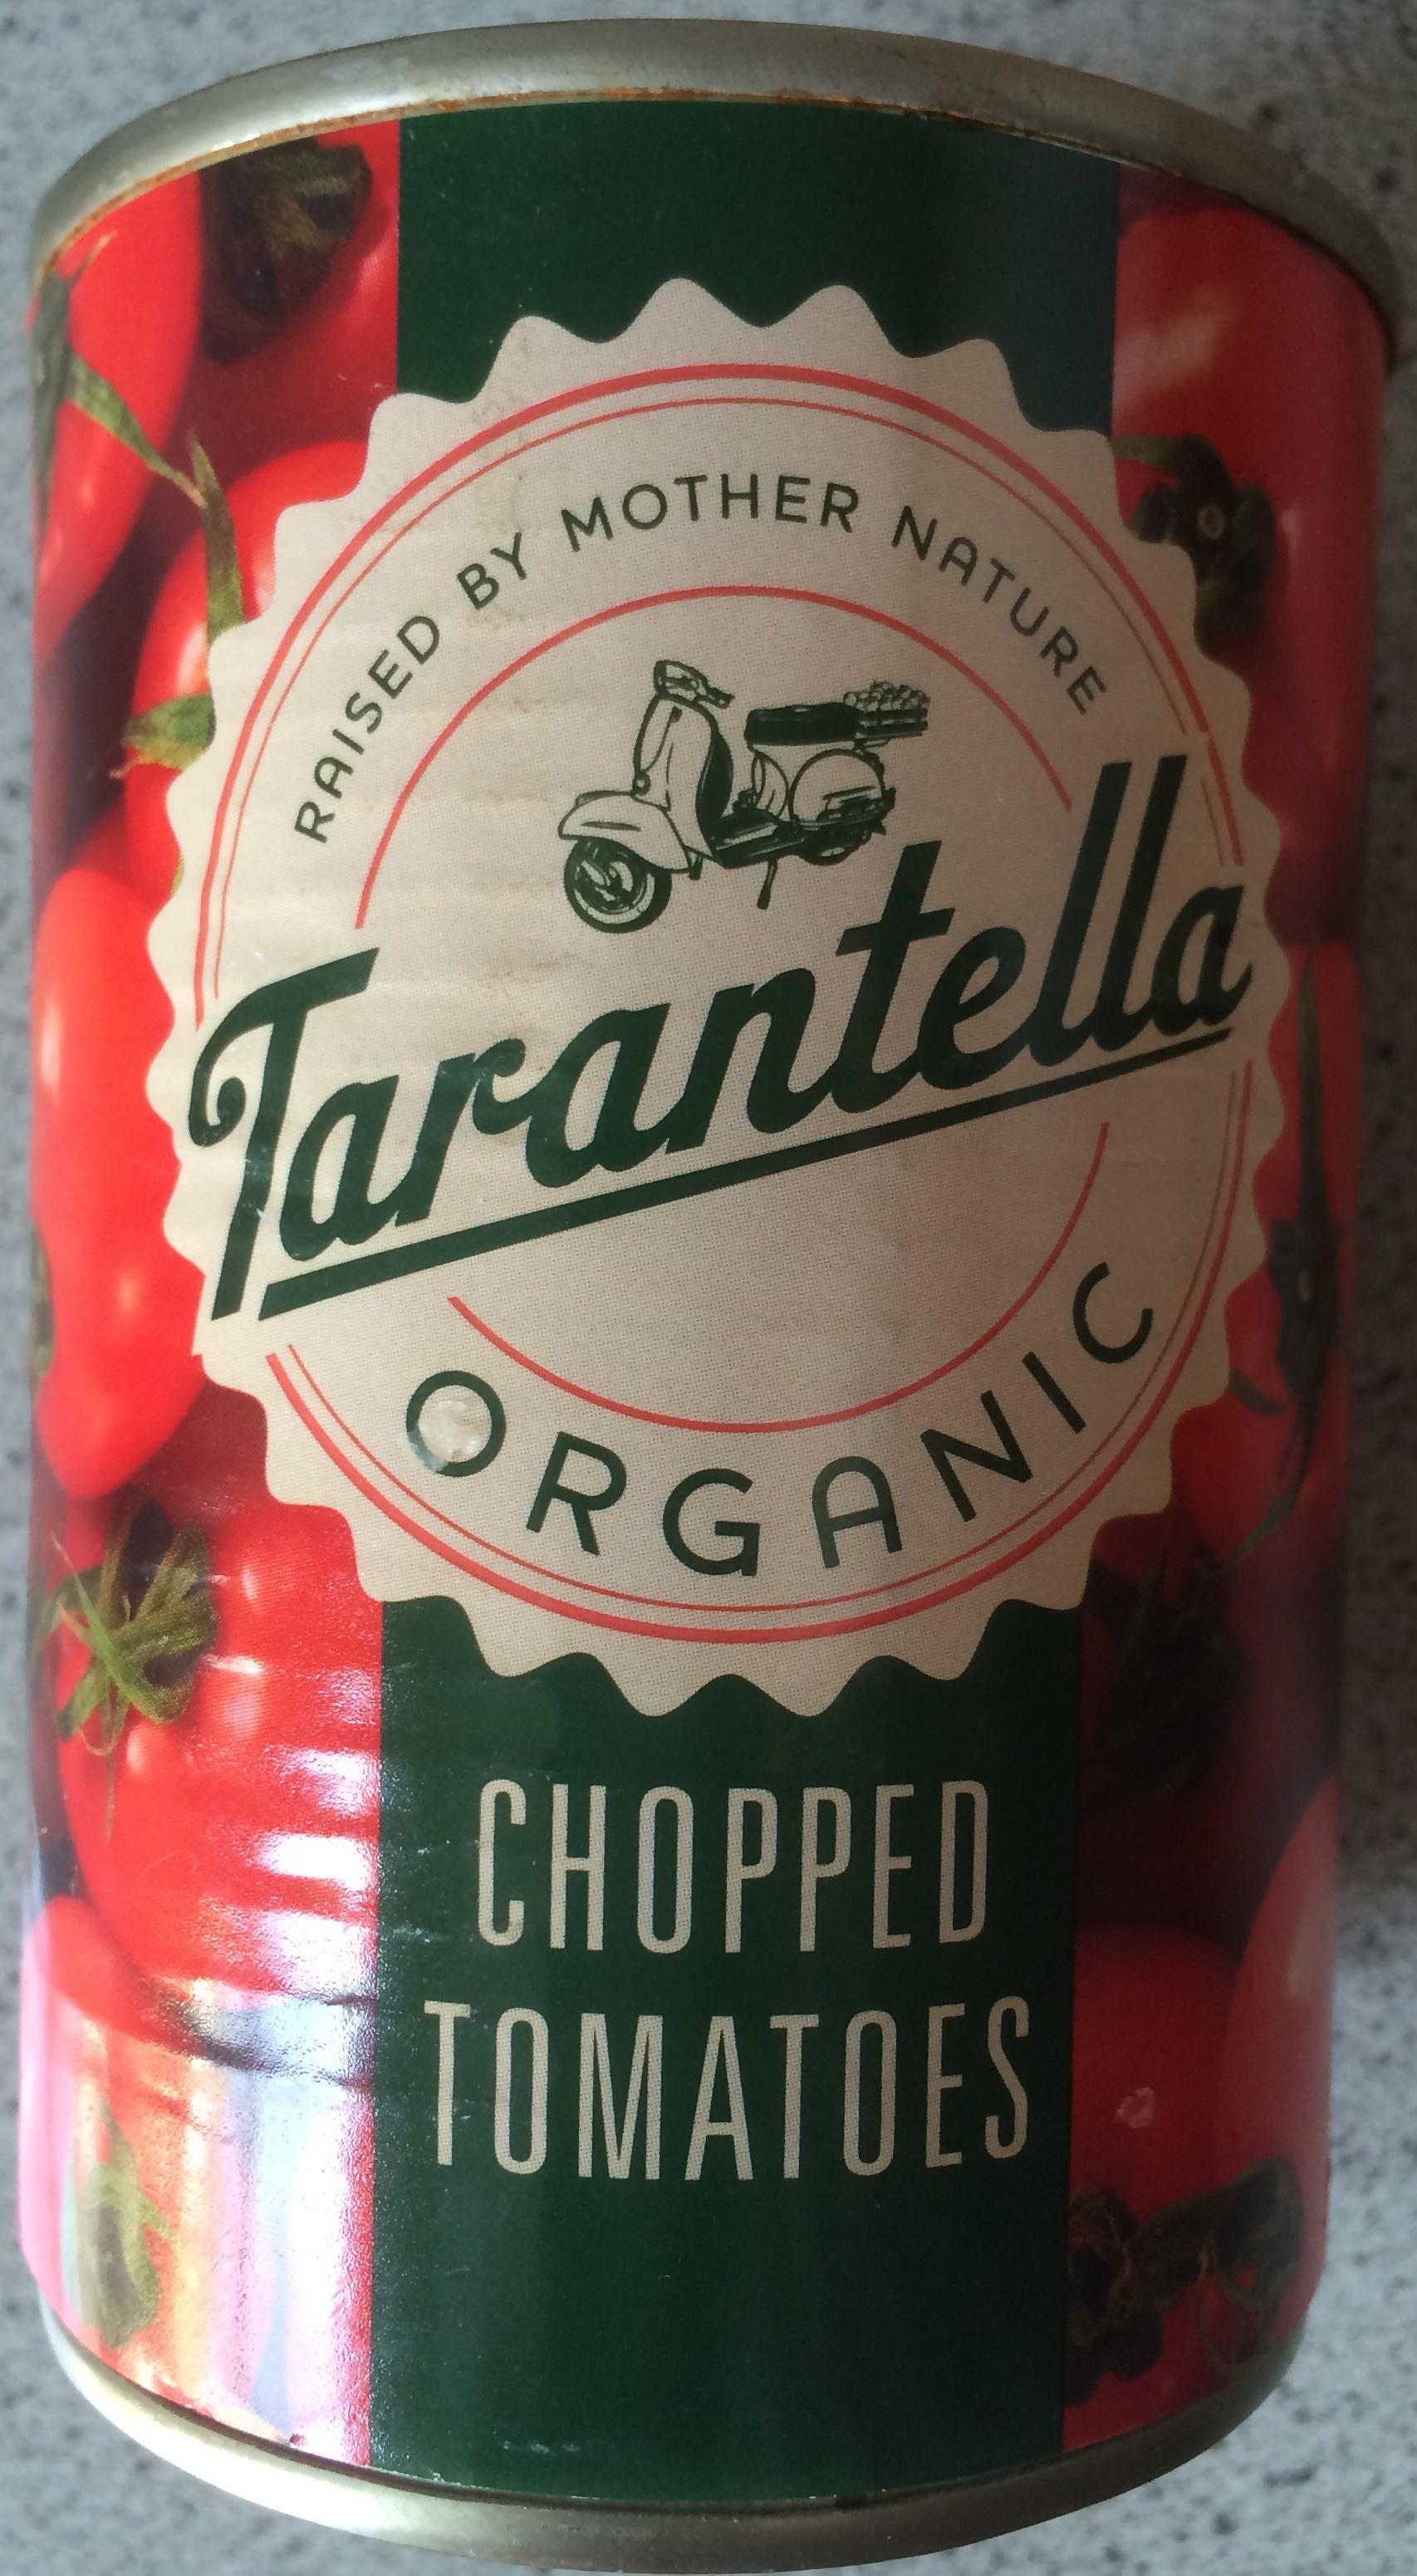 Tarantella Organic Chopped Tomatoes - Product - en